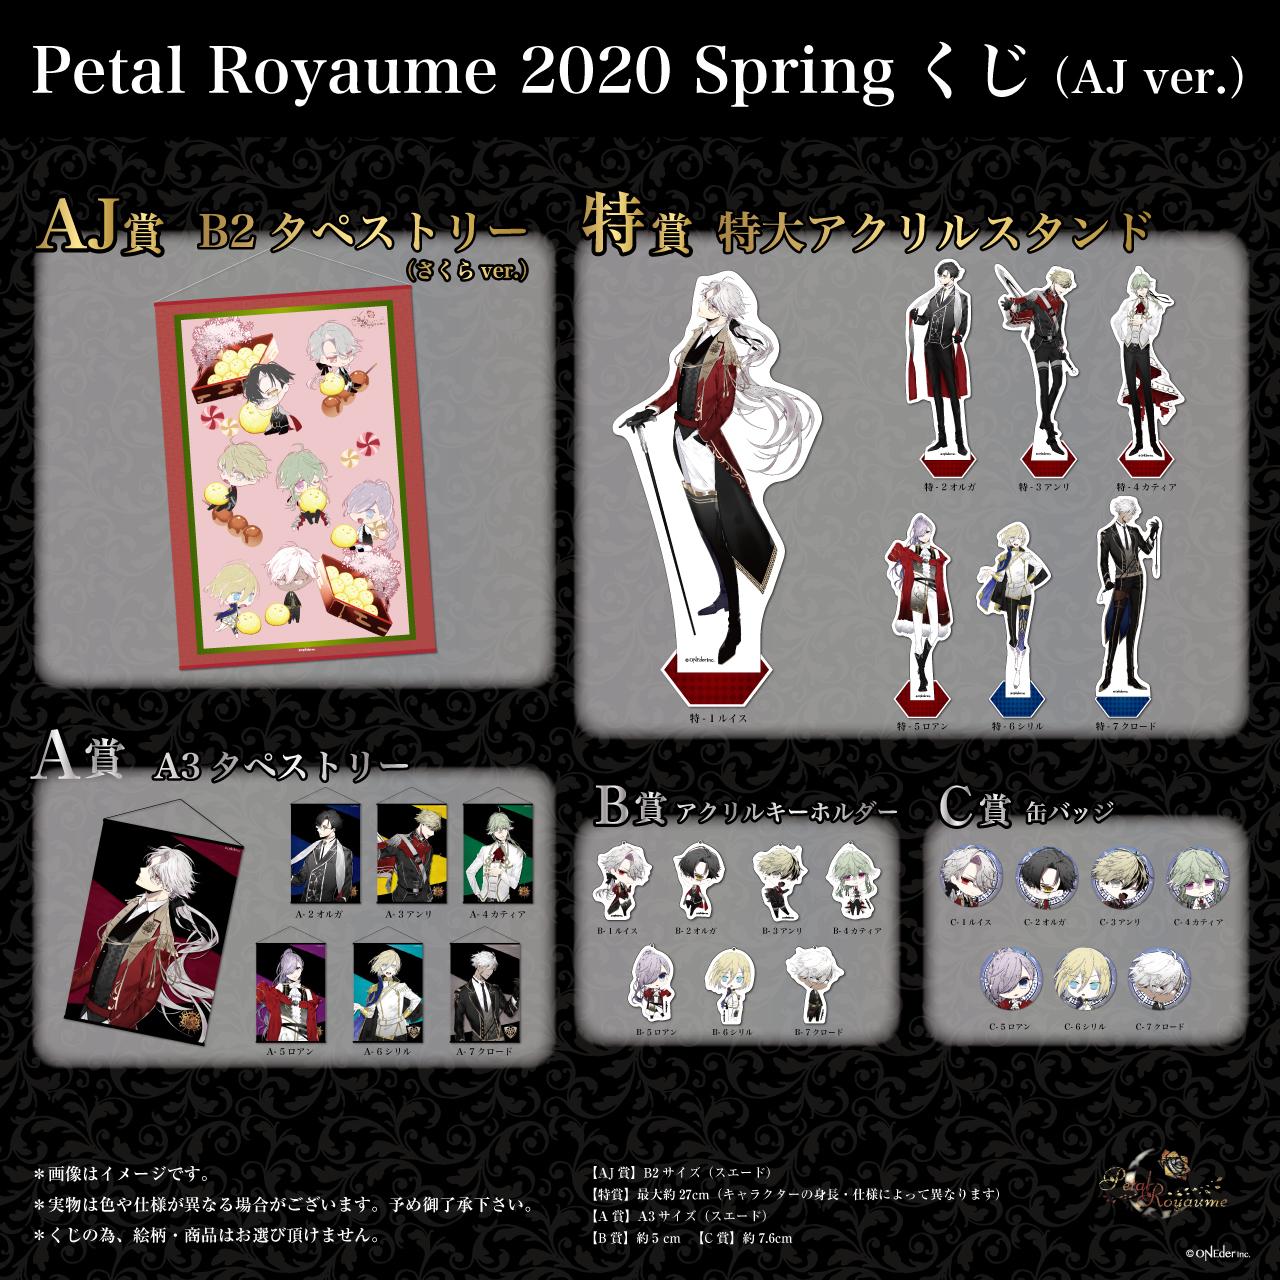 (LOT)Petal Royaume 2020 Spring くじ(AJ ver.)